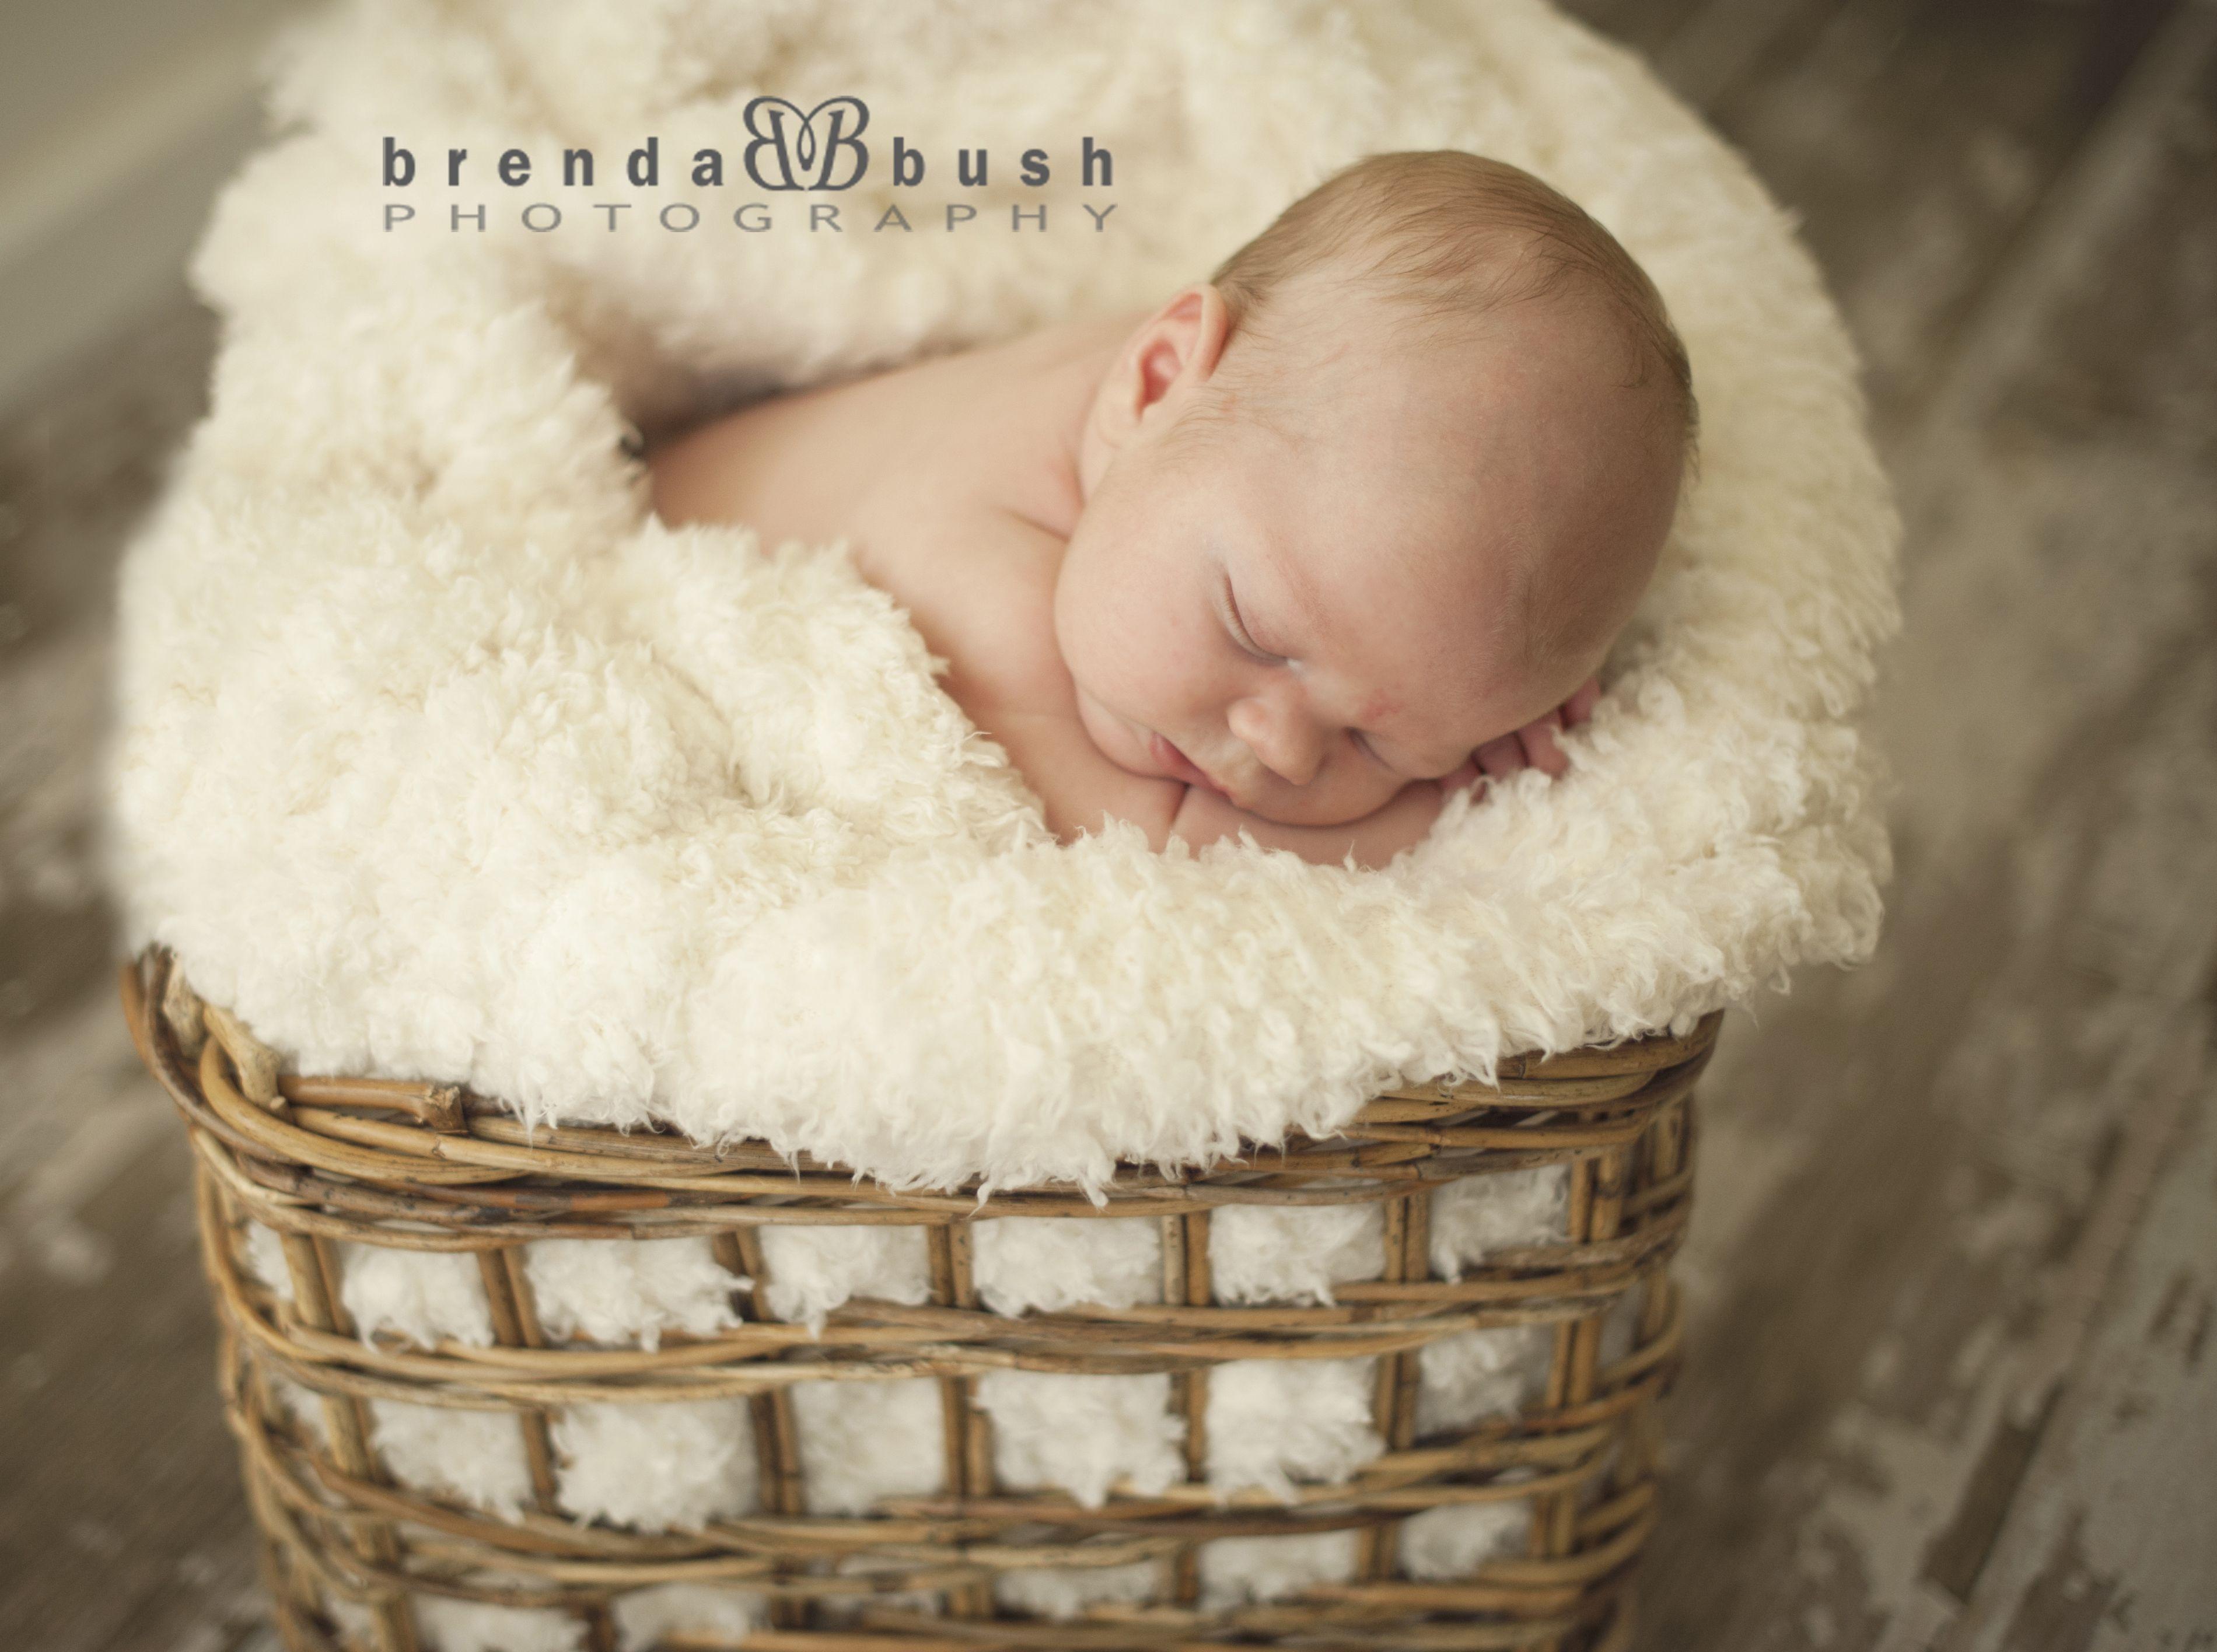 Newborn photo prop bamboo basket